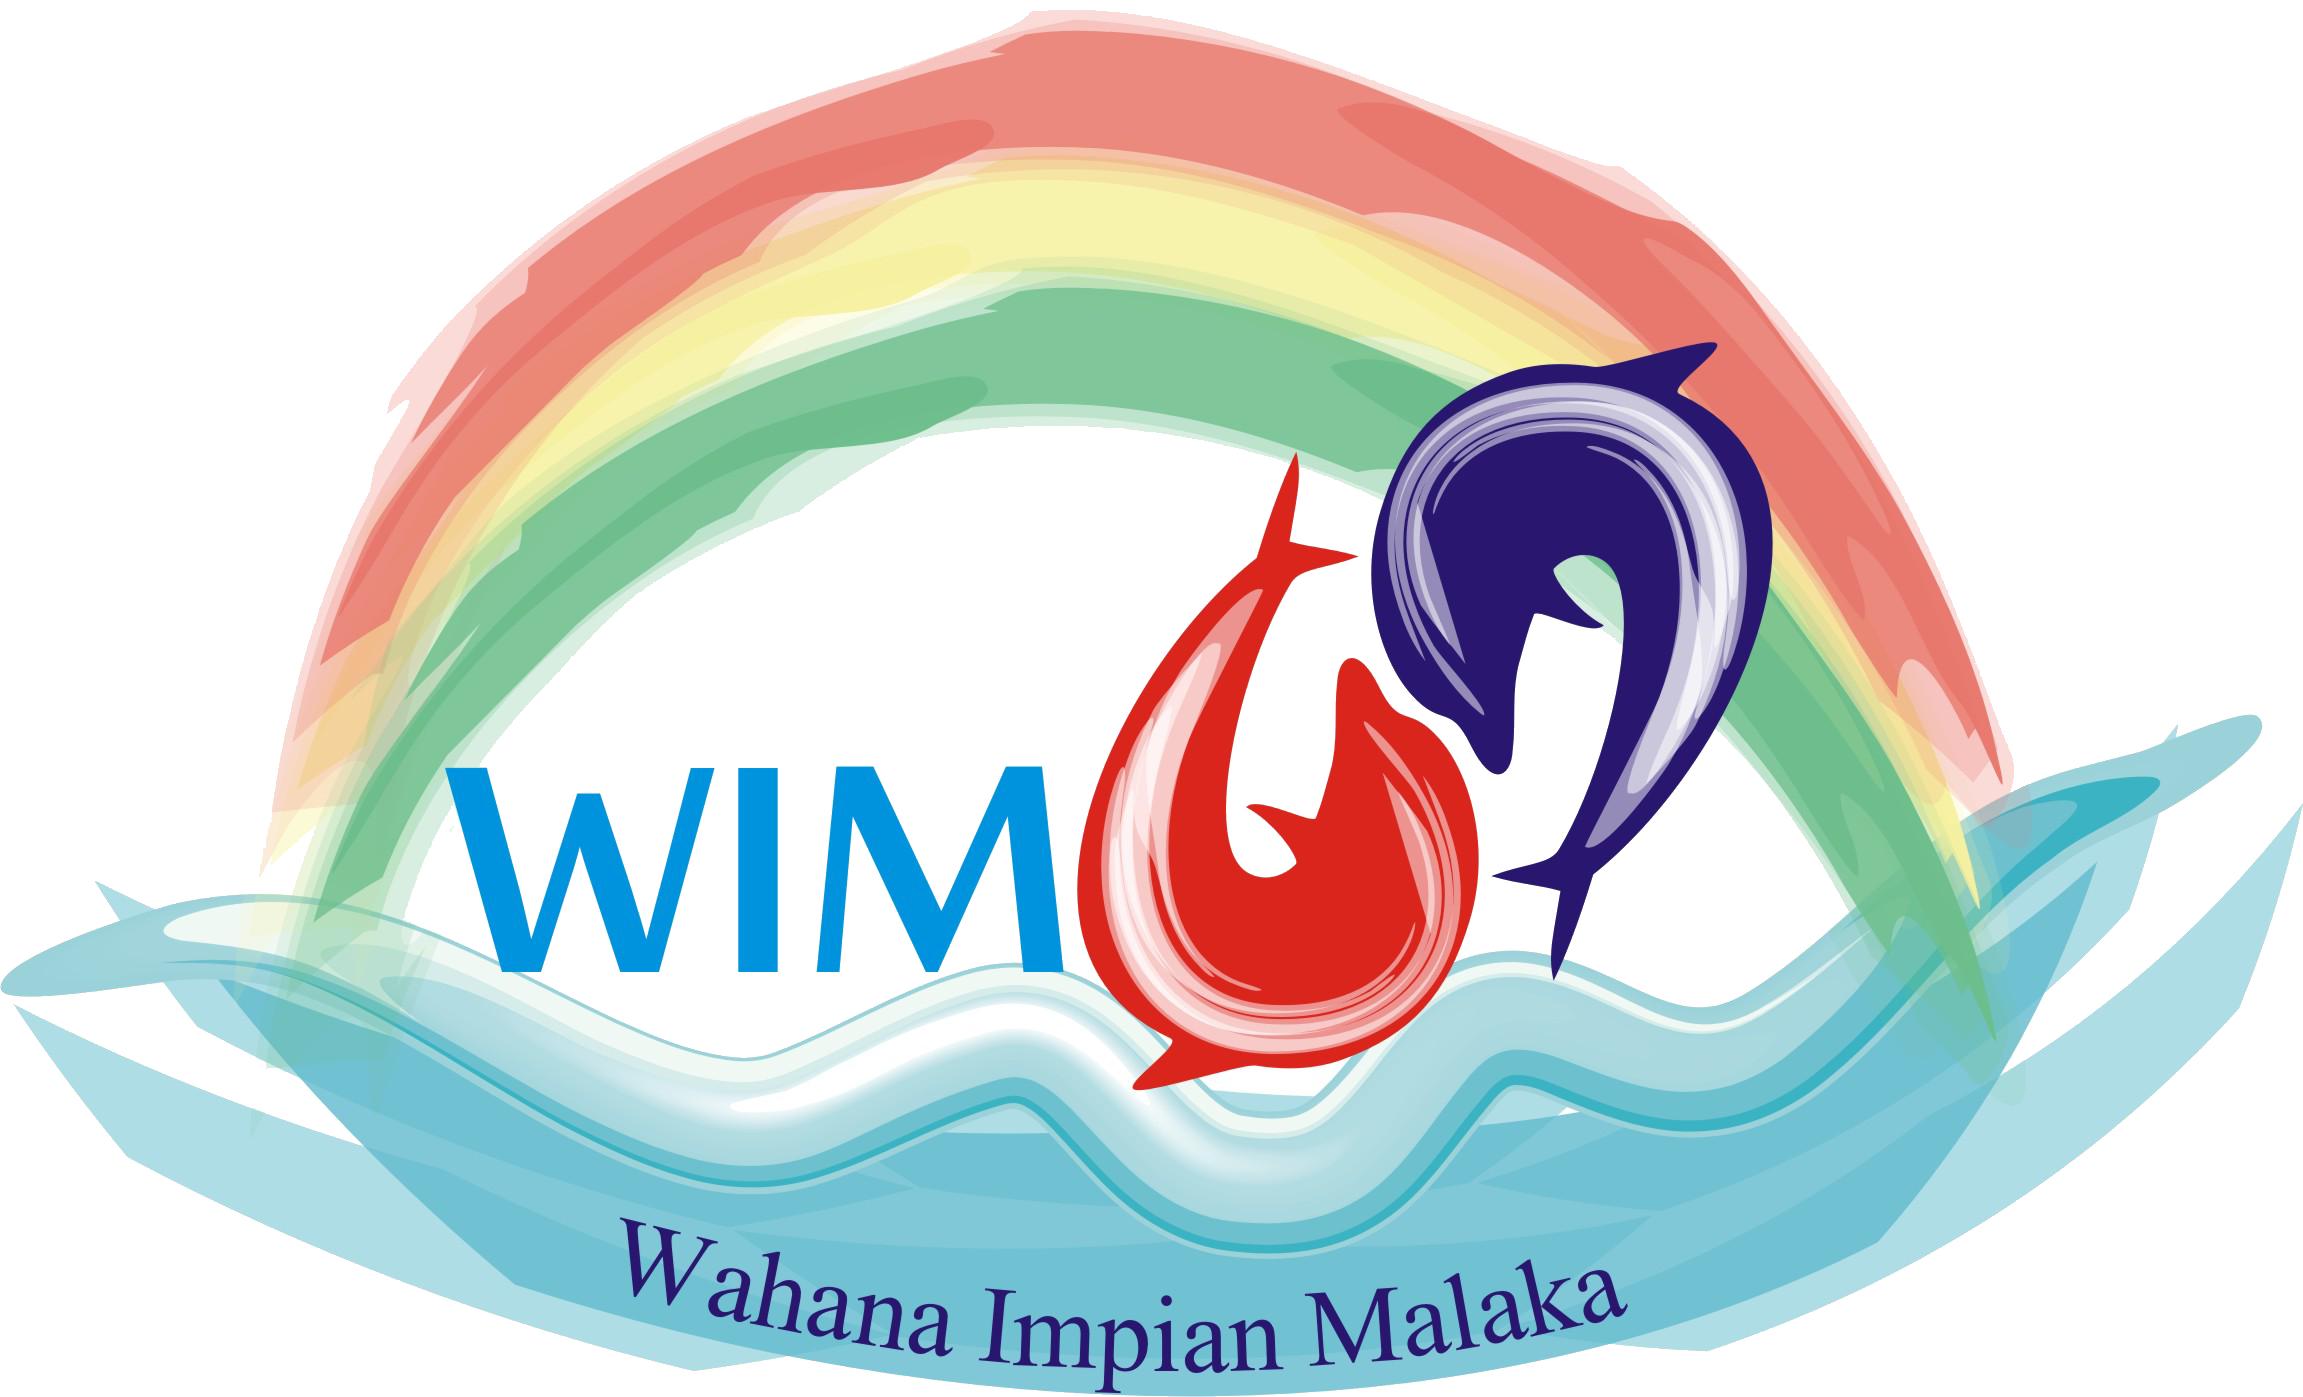 Waterboom Samahani Nge Job Sambil Liburan Steemit Img 20150702 232143